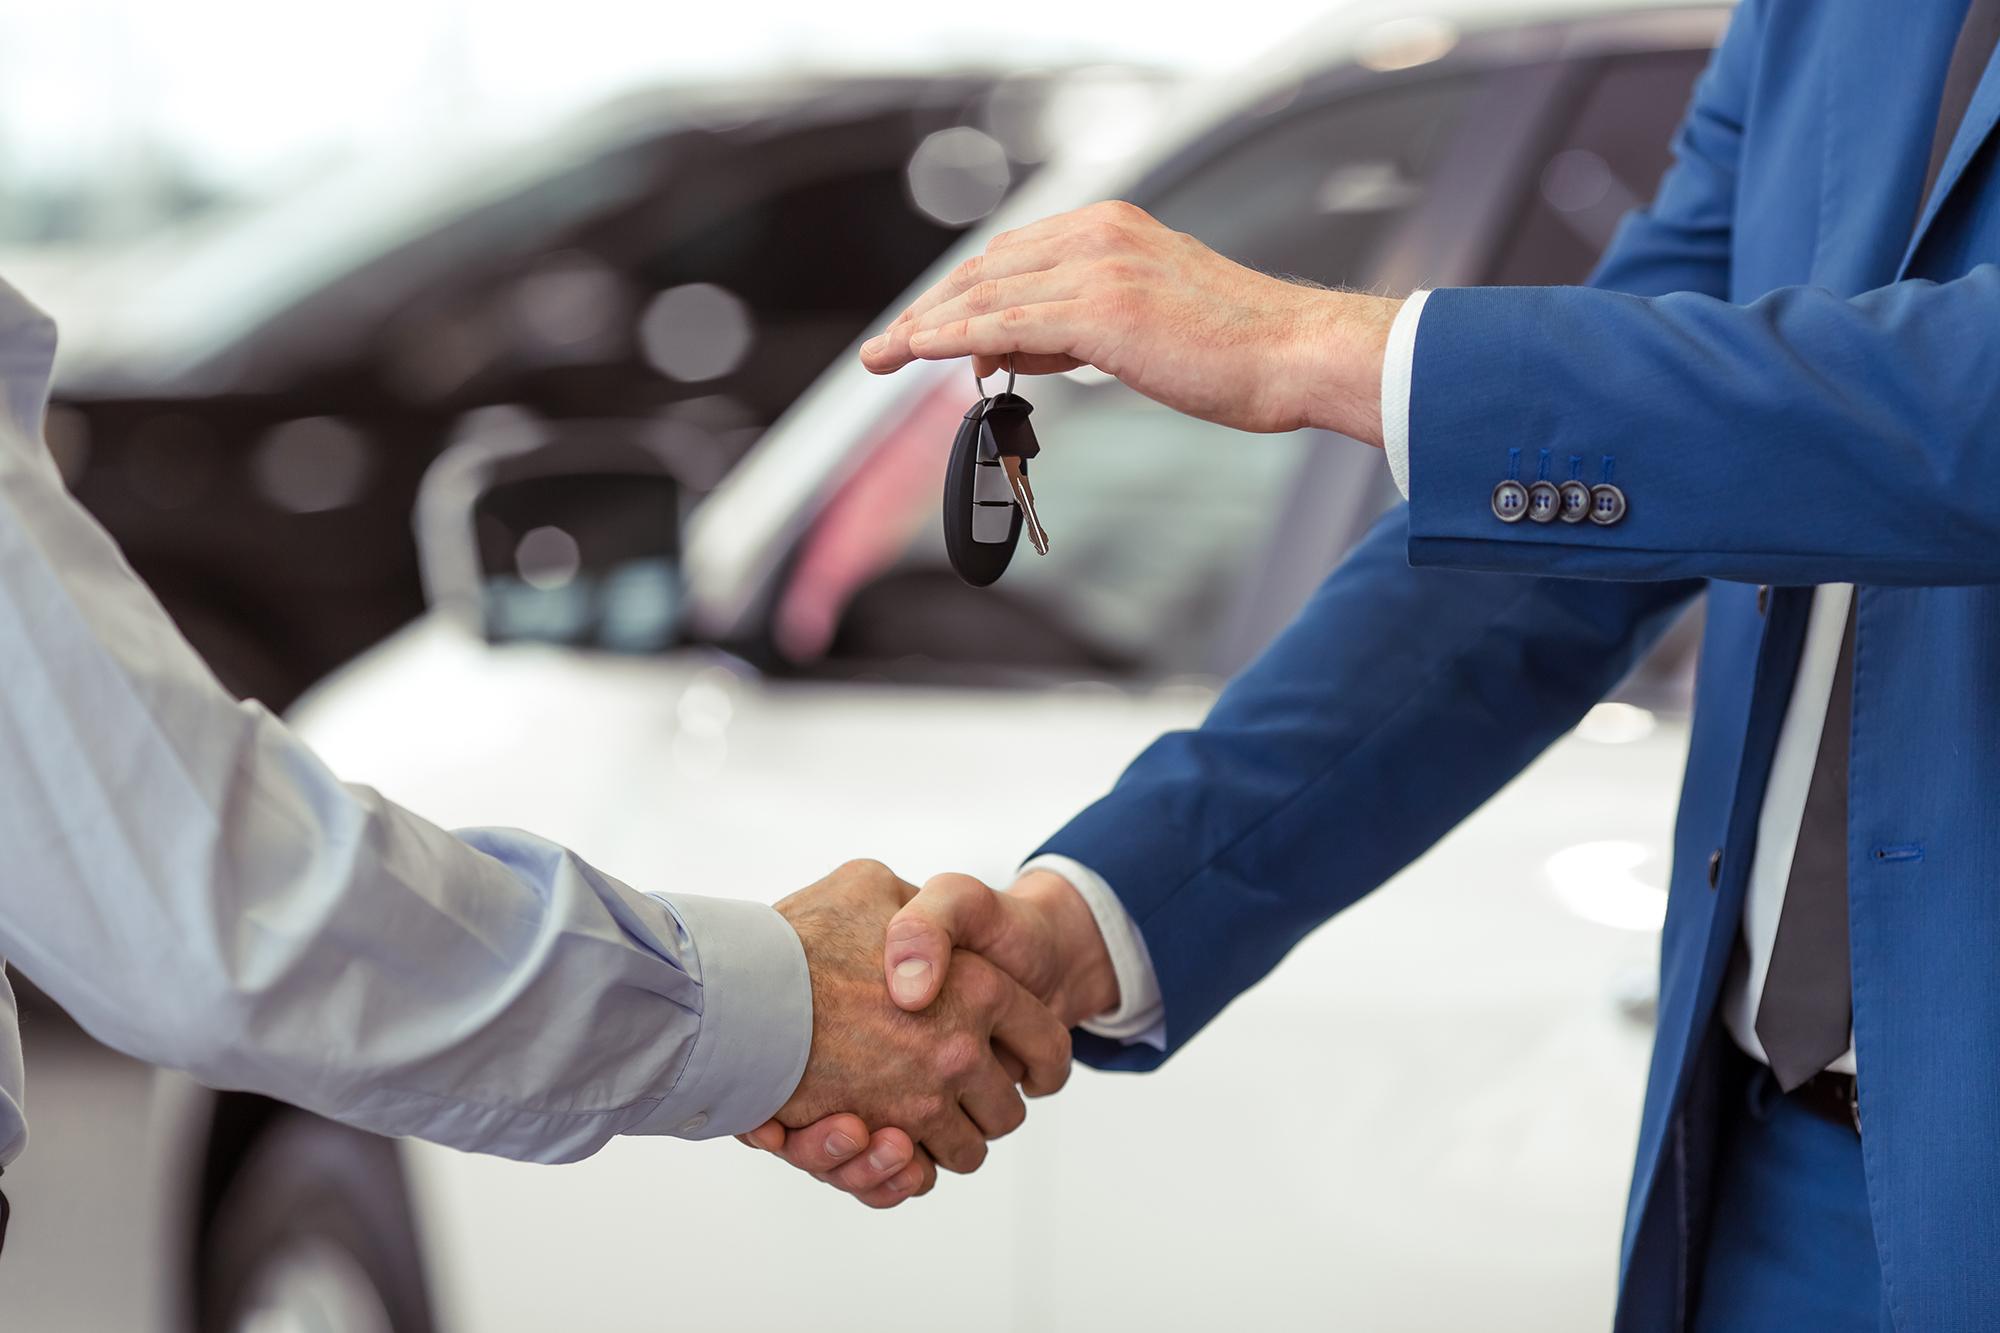 Two men shaking hands. (Image: Shutterstock)